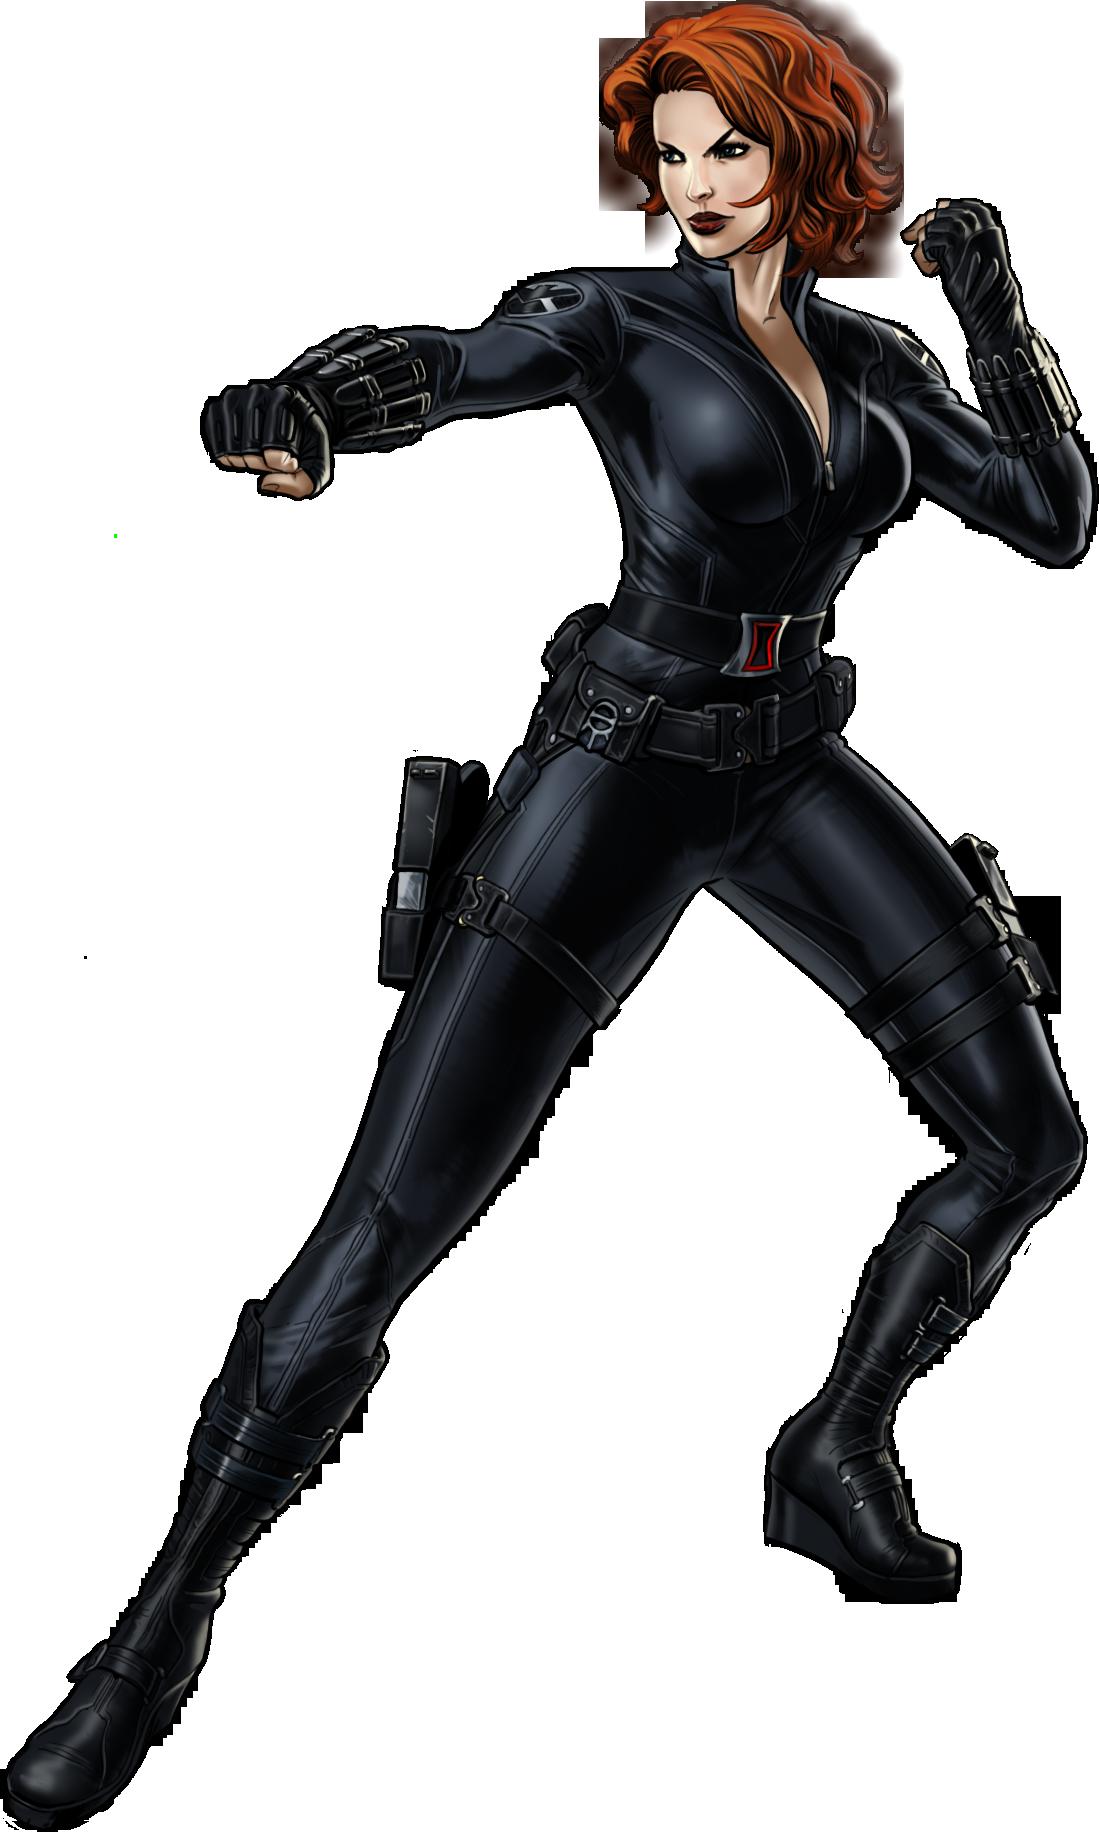 Hero clipart black widow. Image b portrait art